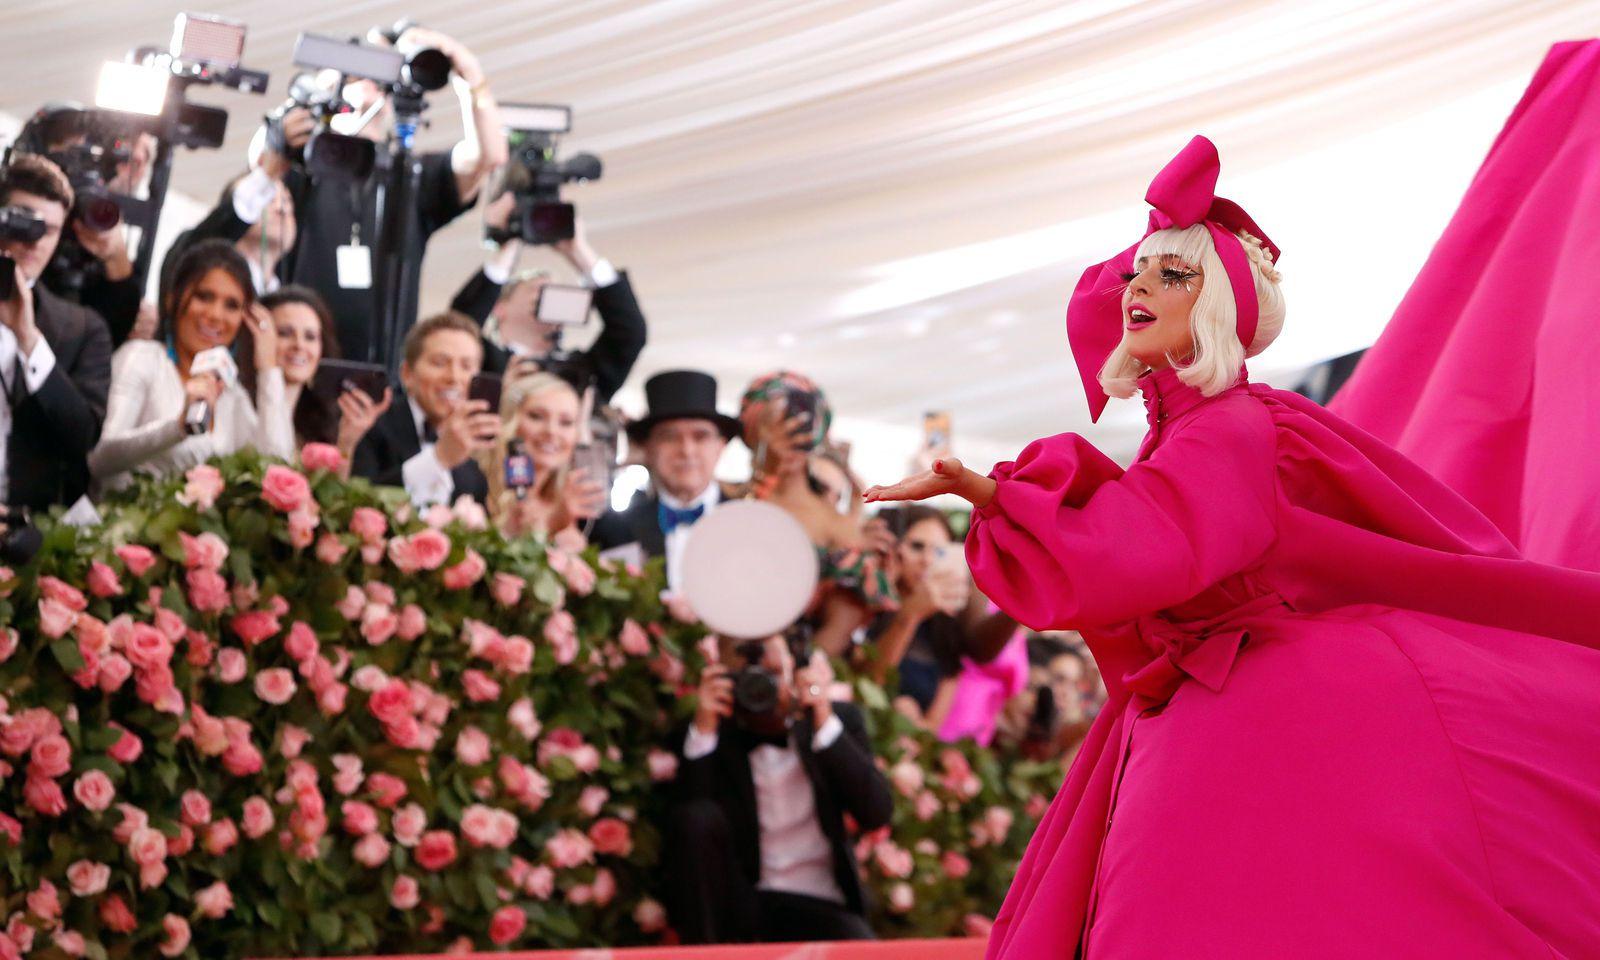 Metropolitan Museum of Art Costume Institute Gala - Met Gala�-�Camp: Notes on Fashion - Arrivals�- New York City, U.S.